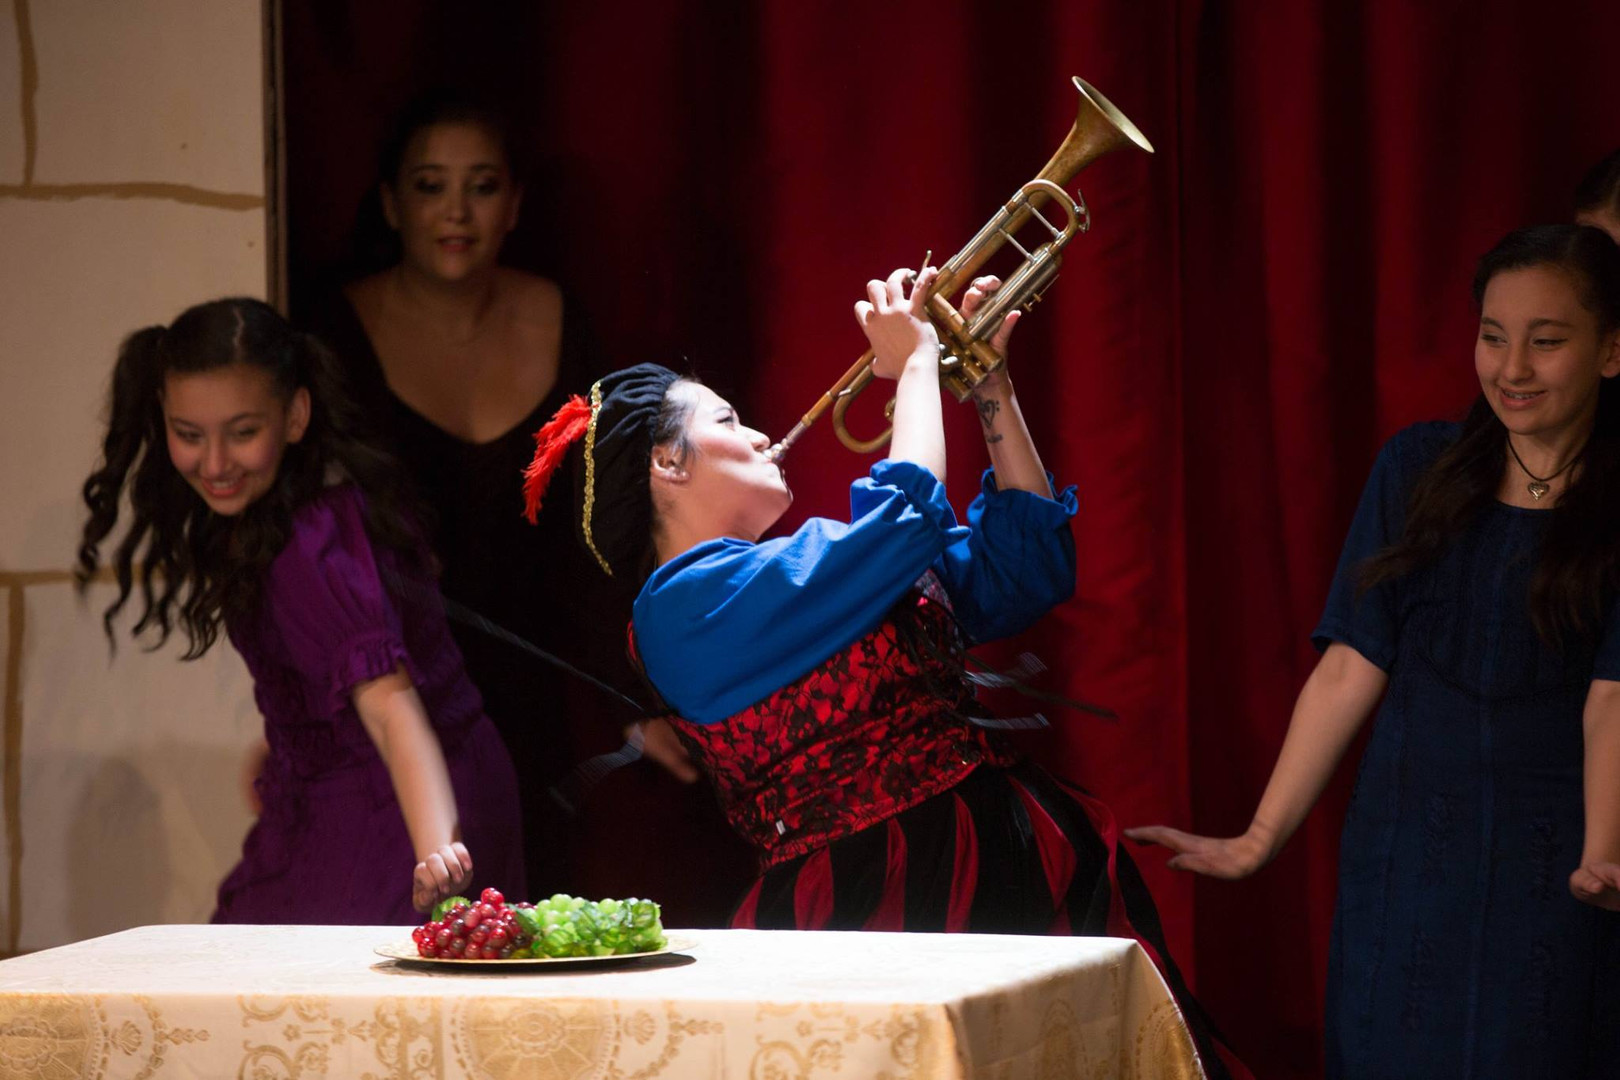 Tanya De Leon (Royal Page), Three Act Theatre Company.  Photo by Micah Jay Photography.